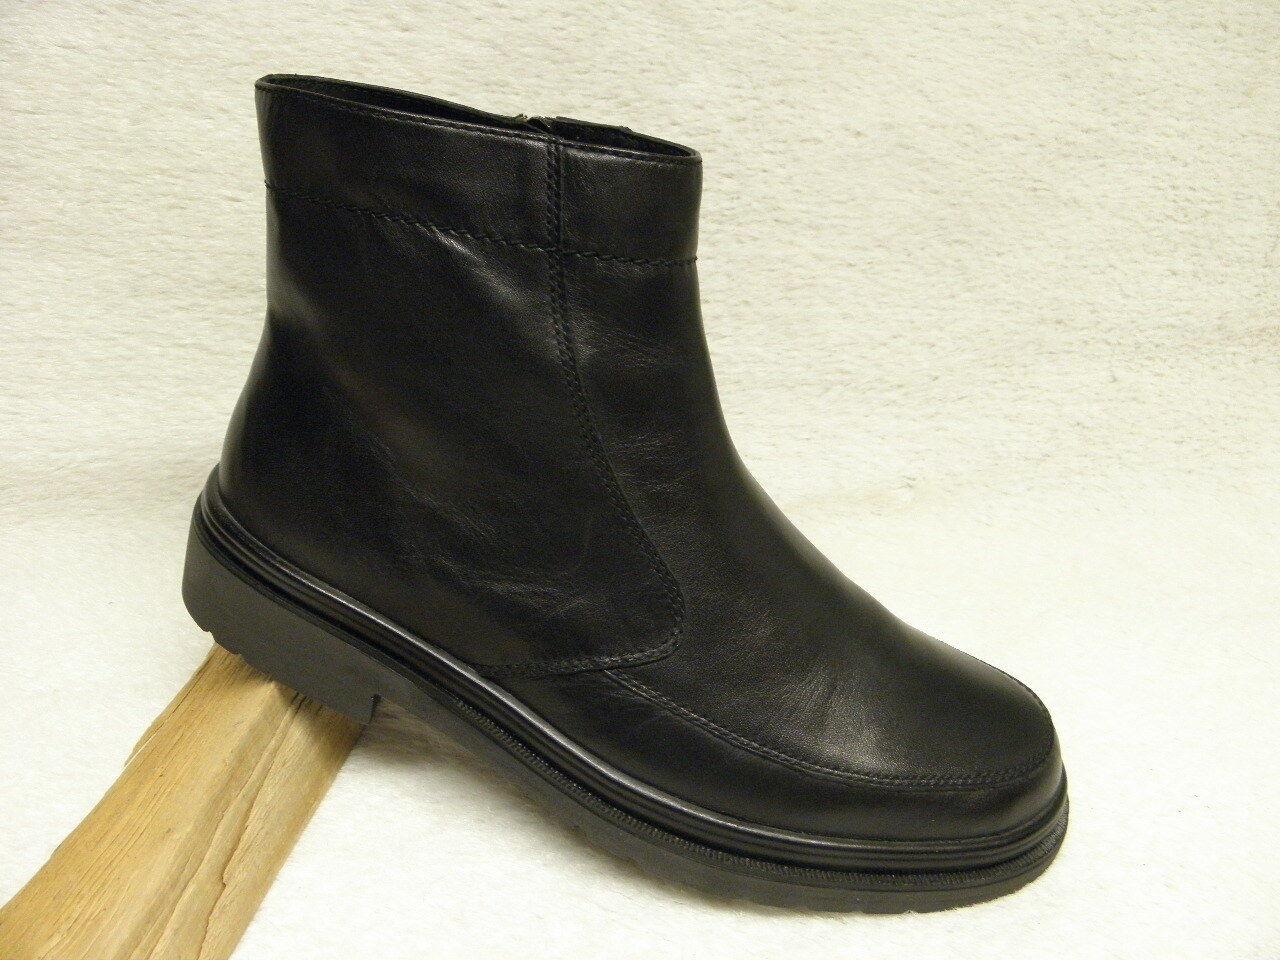 ara ®  SALE bisher 149,95 € schwarz  gratis Premium - Socken (Z187)